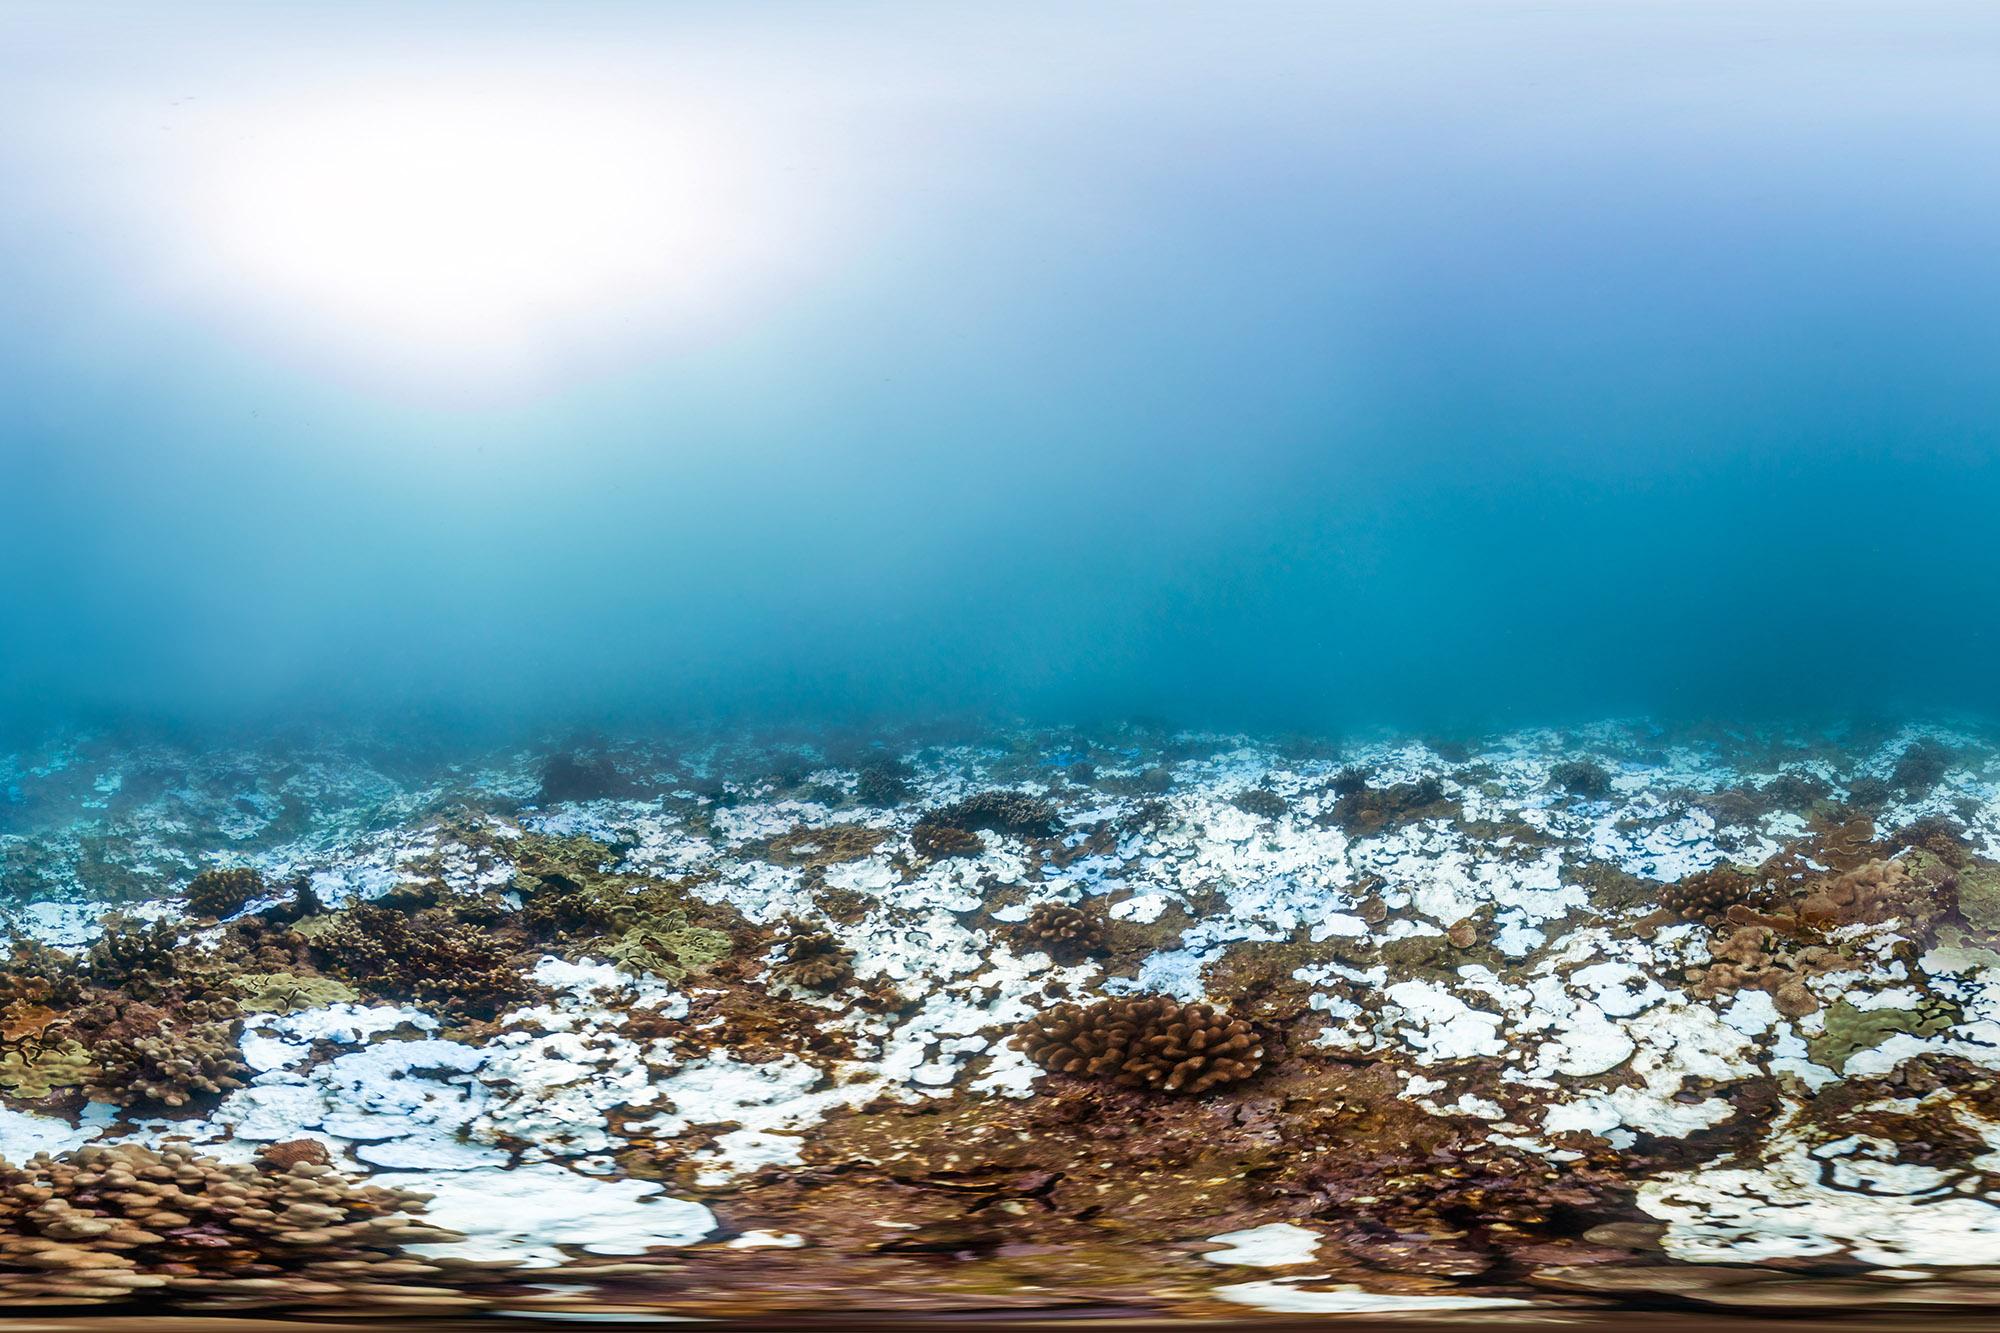 maui, hawaii, nov 2015 credit: THE OCEAN AGENCY / XL CATLIN SEAVIEW SURVEY